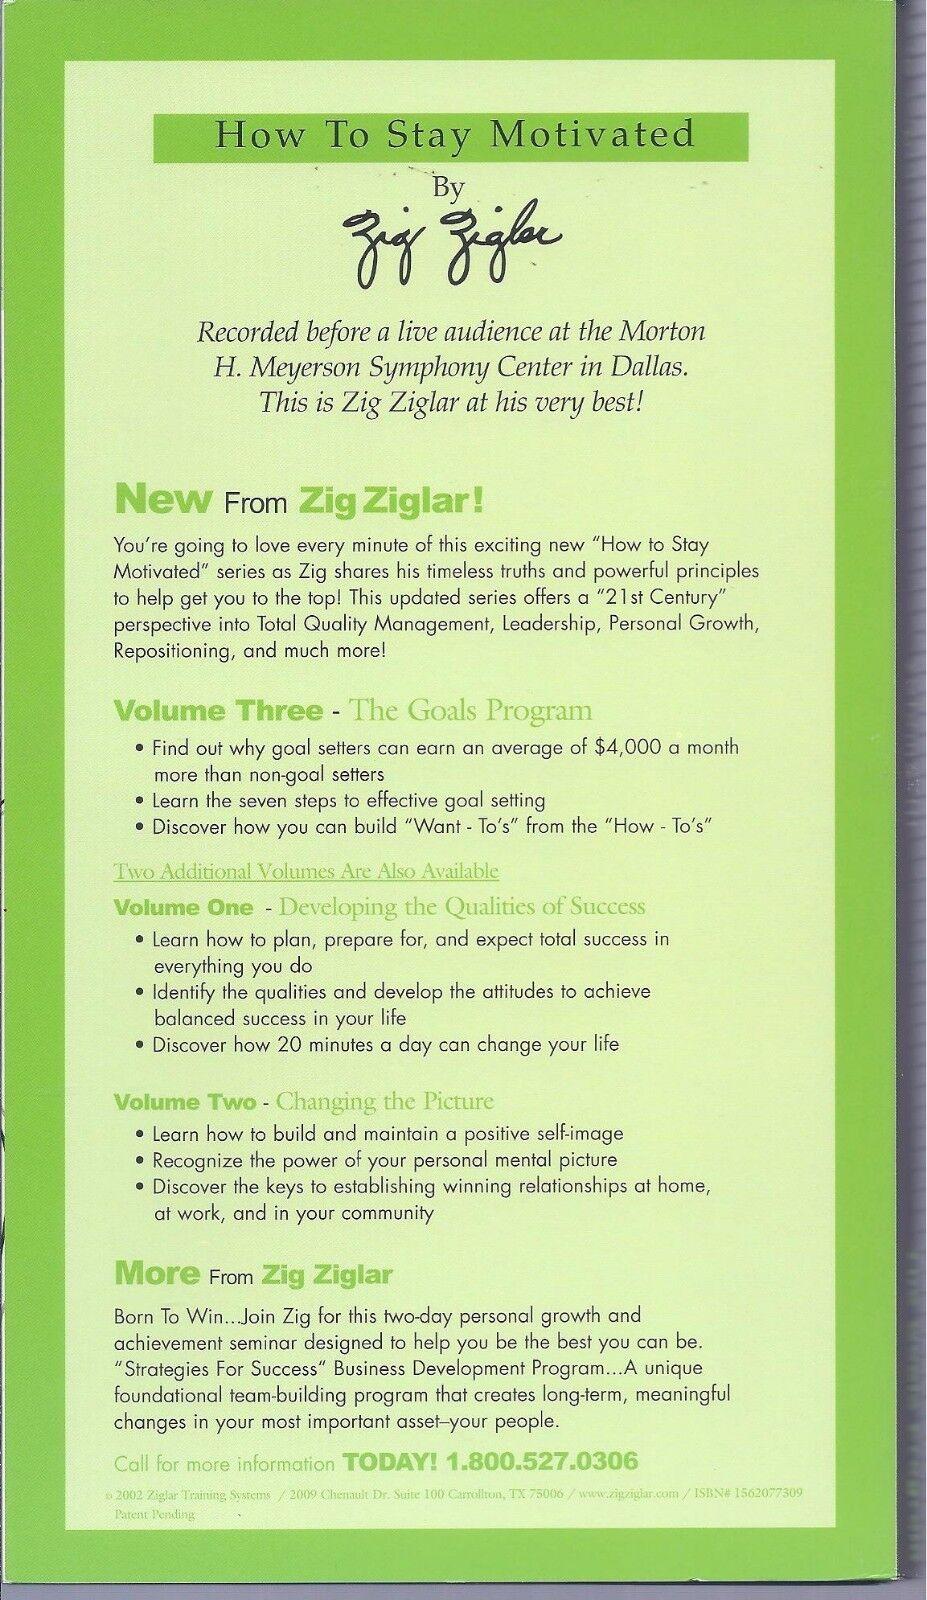 How To Stay Motivated - Volume 1. 2 3 By Zig Ziglar - 19 Audio CD Set - $179.99